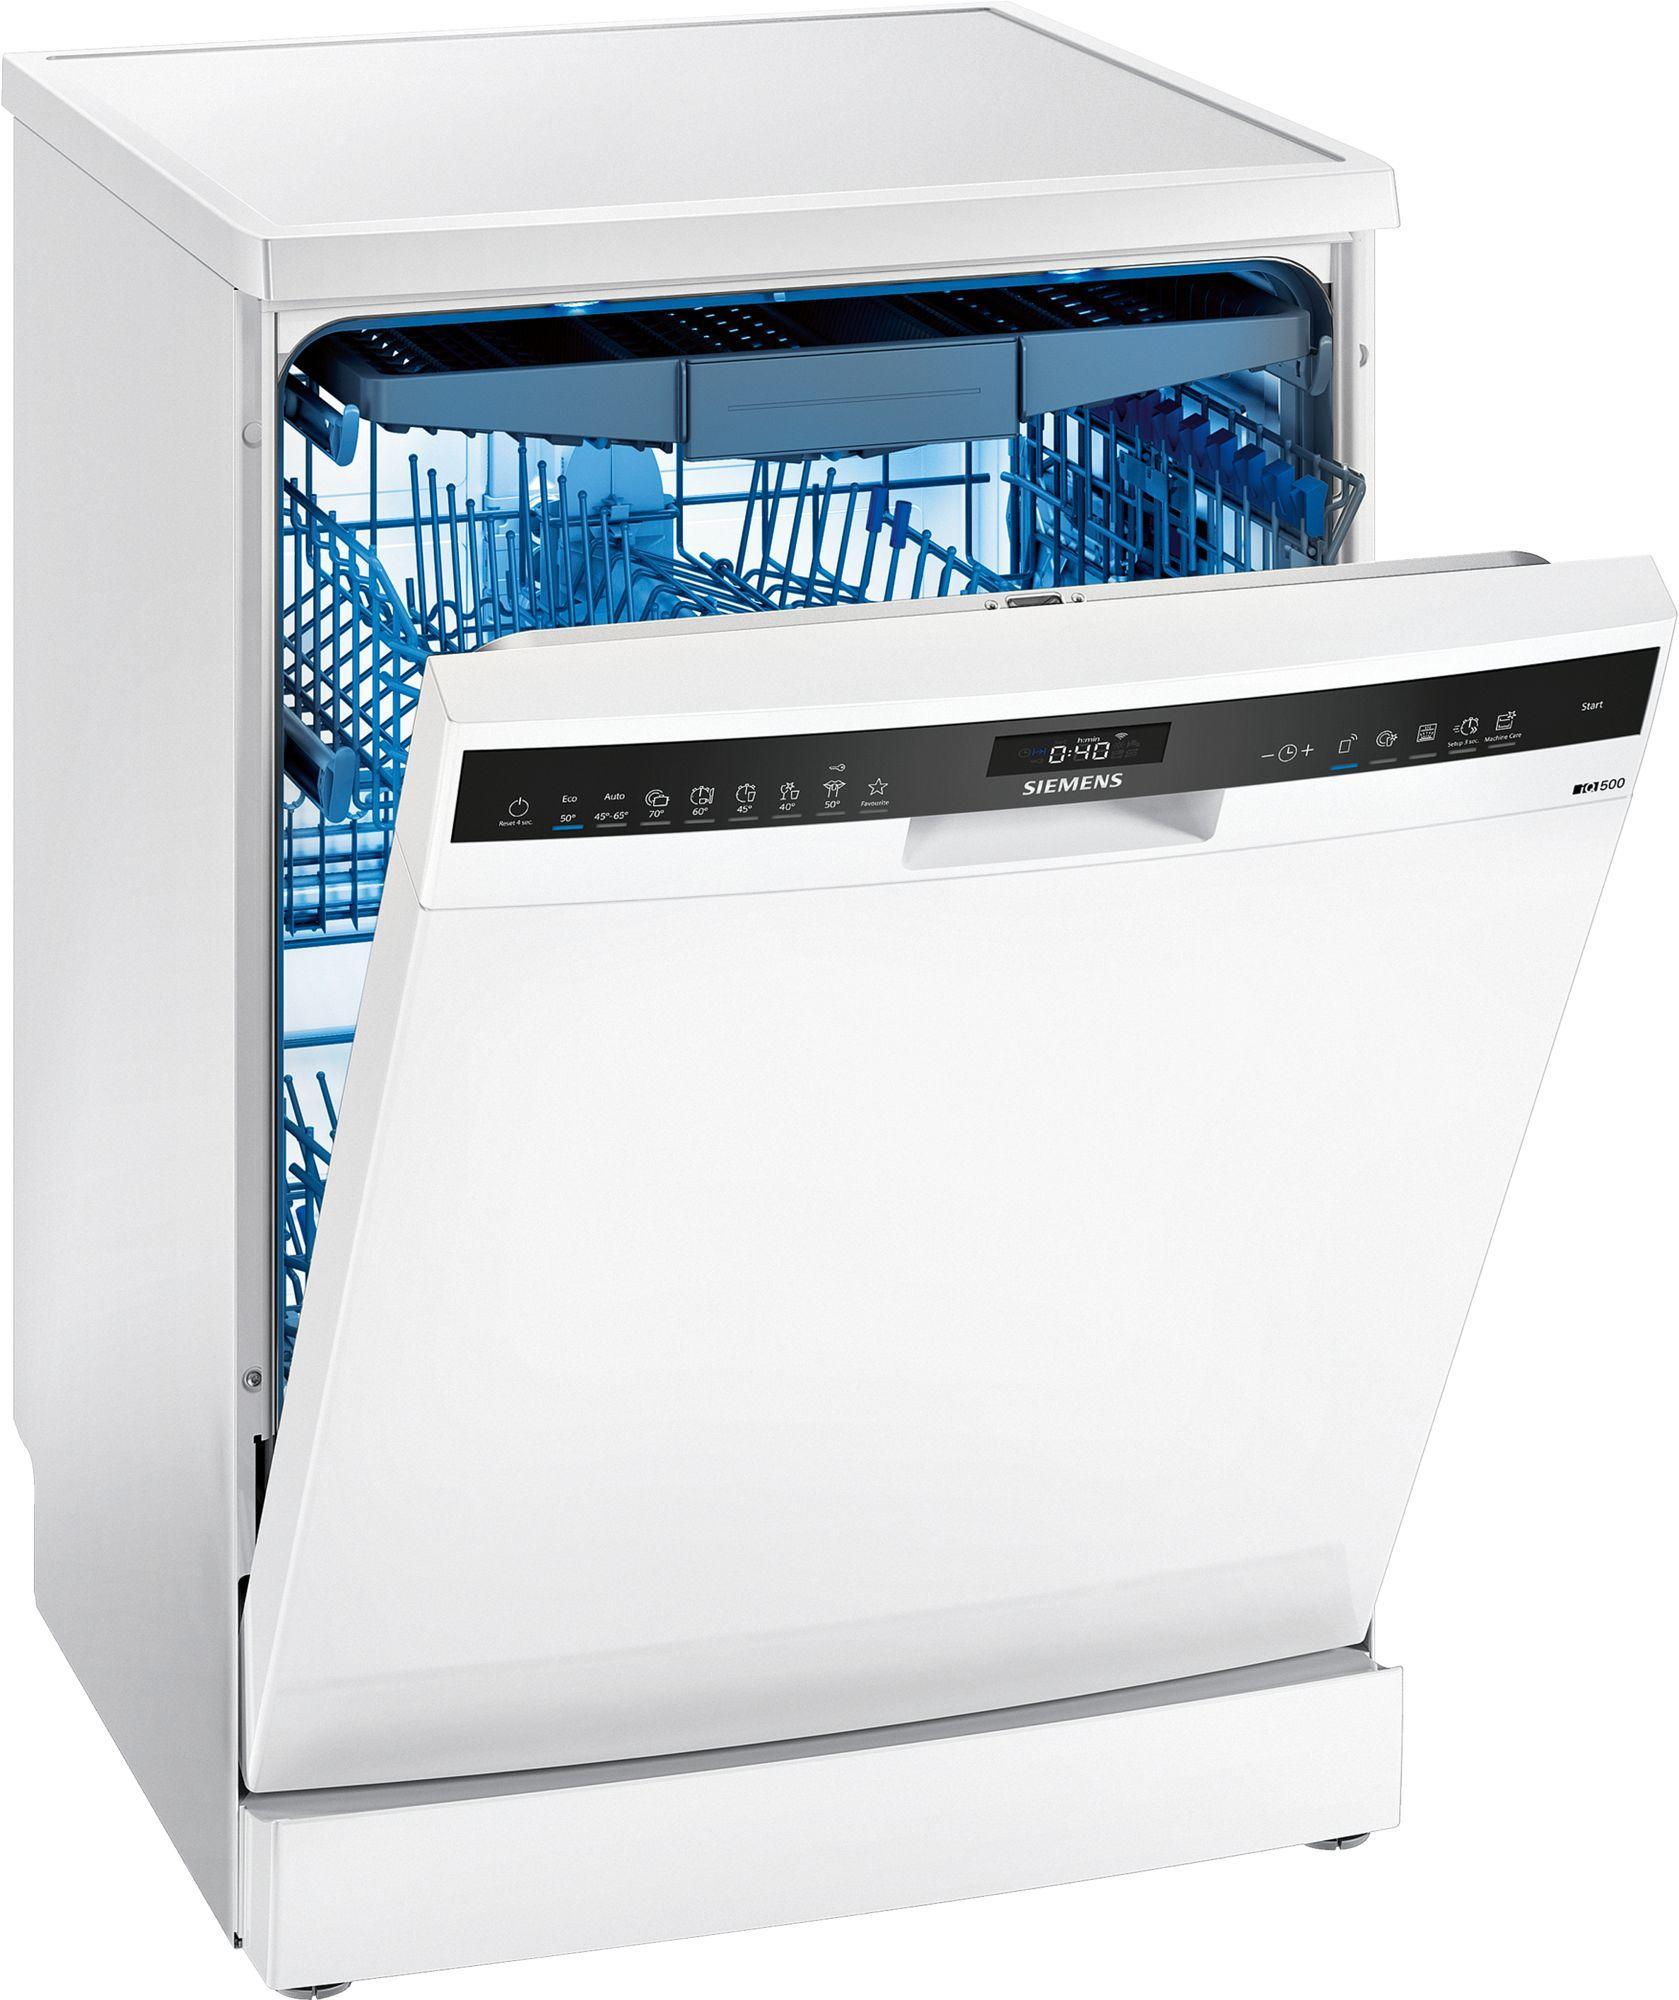 Image of iQ500 SN25ZW49CE 60cm Standard Dishwasher | White